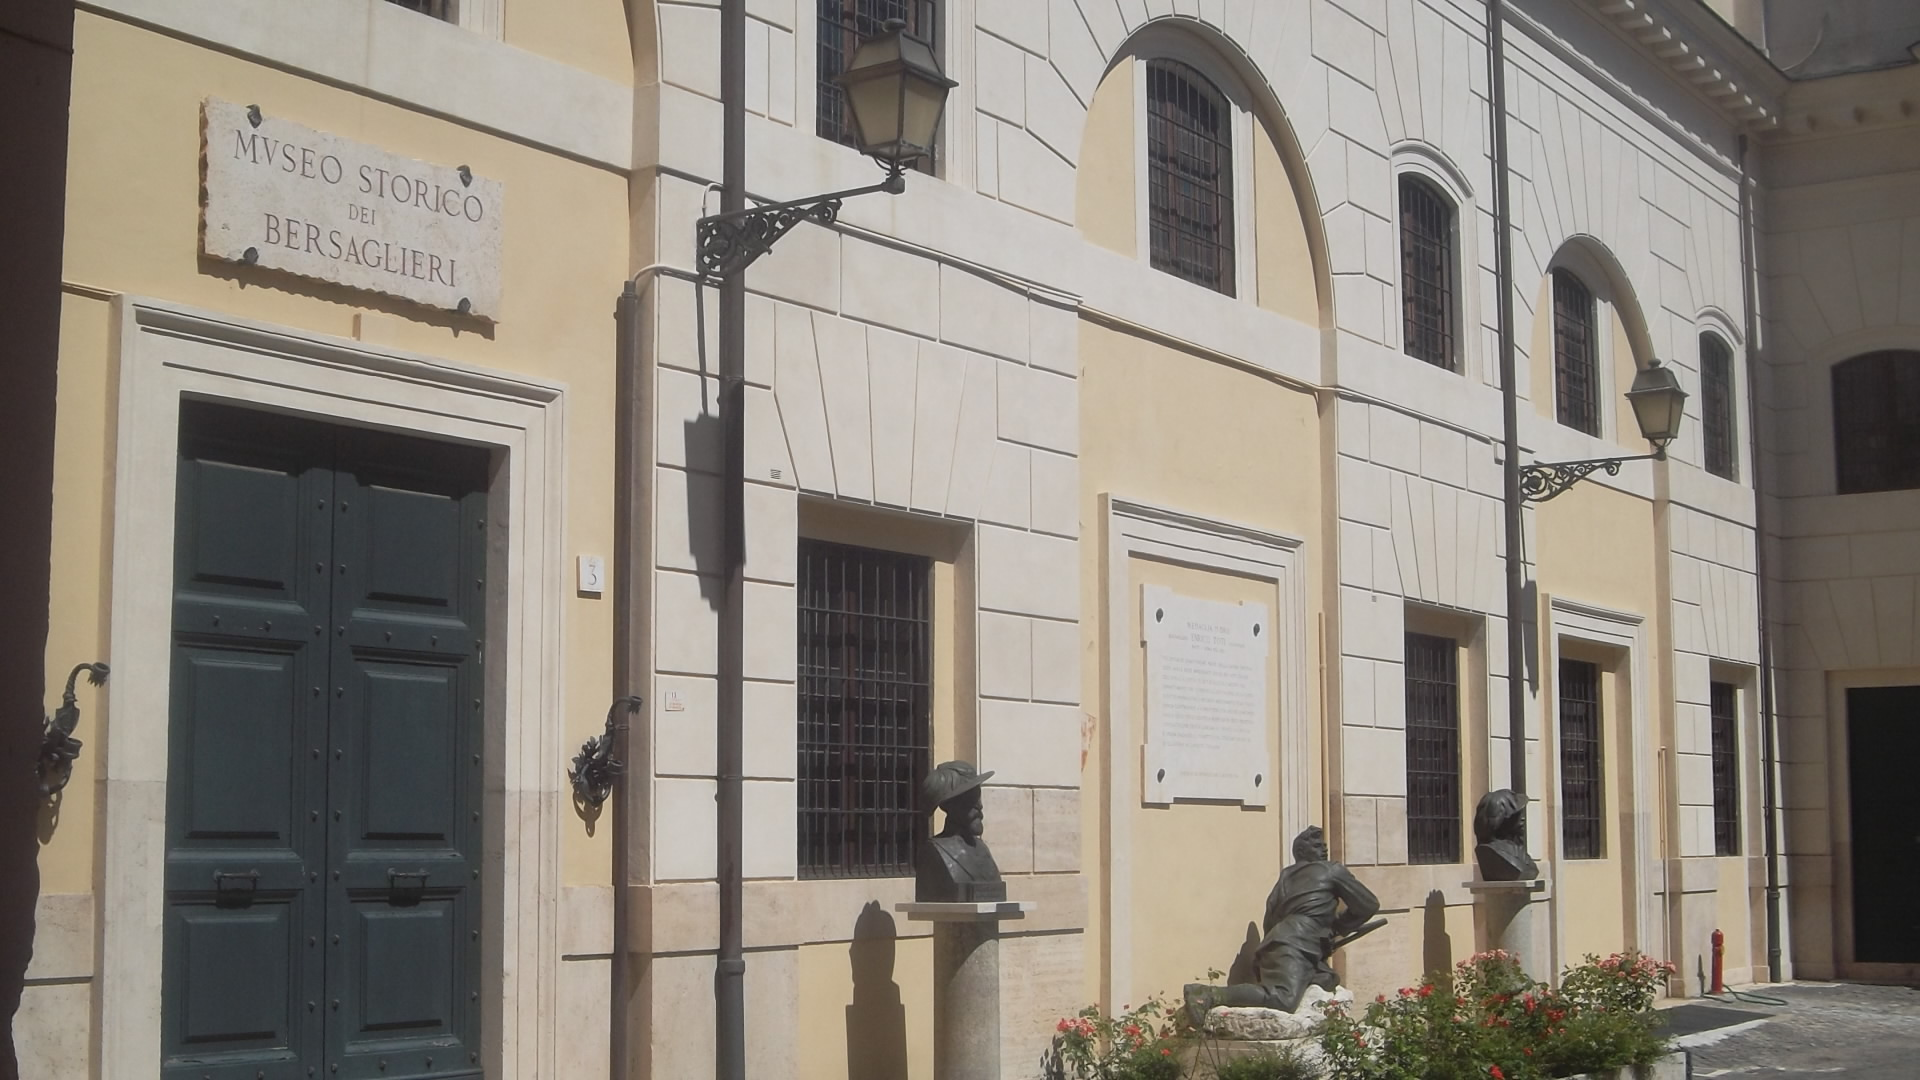 roma-museo-historico-bersaglieri-courtyard-aug13